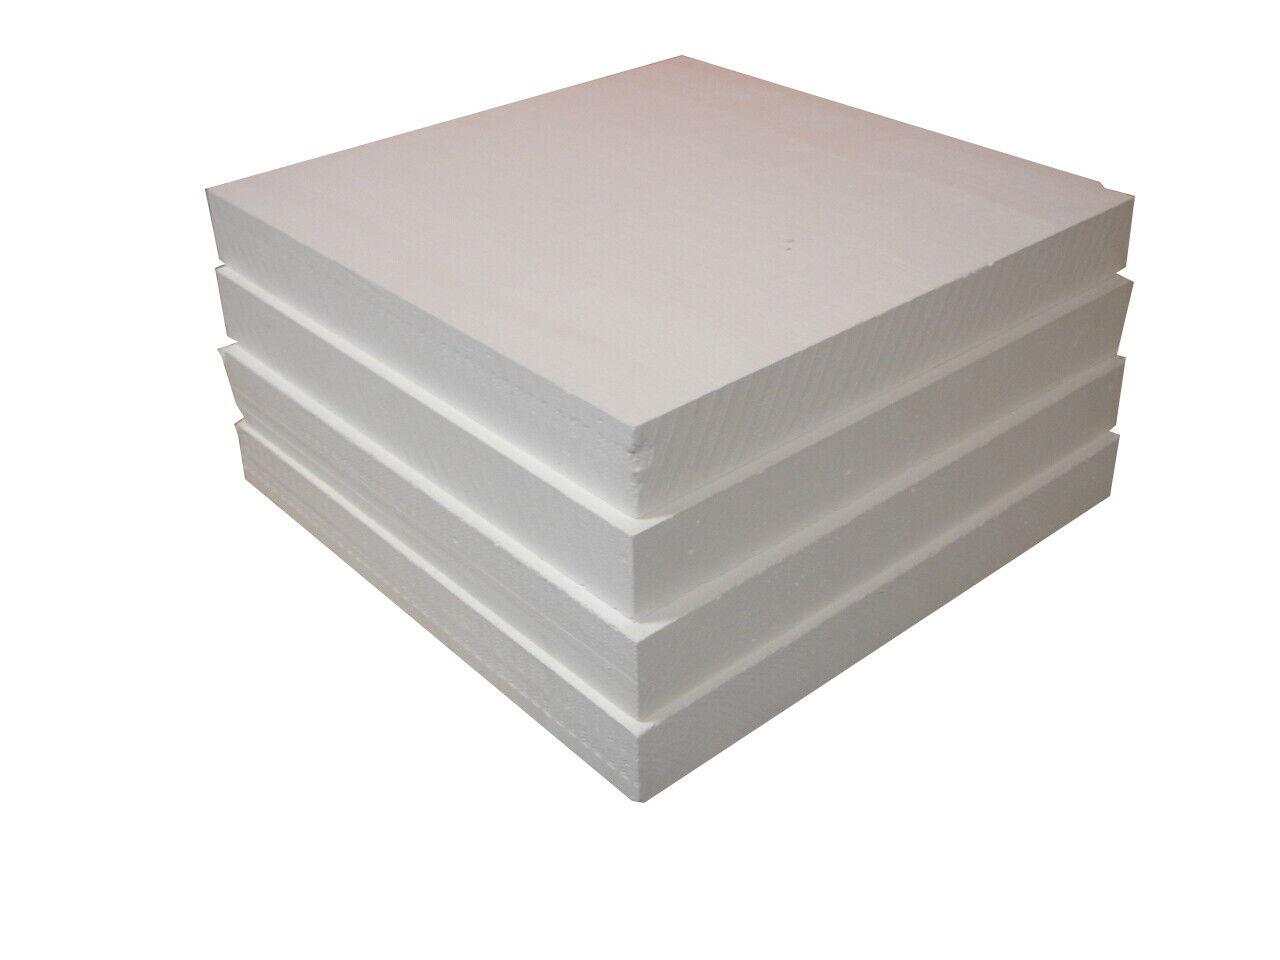 Promat Promasil 950 KS Isolierplatte Wärmedämmung 2 Platten 40 mm, 1000 x 500 mm